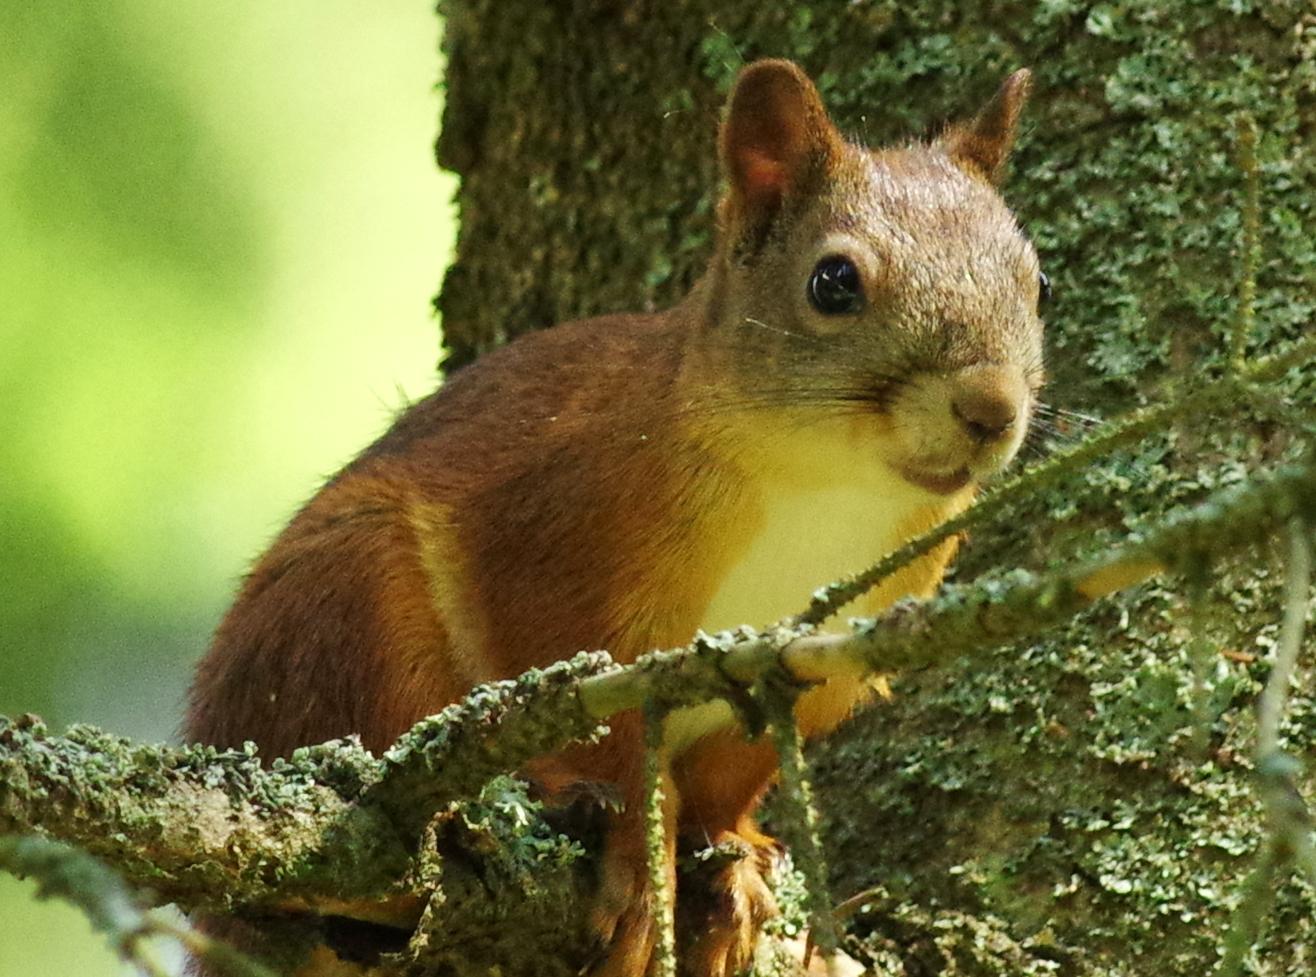 Pihan oravakaveri